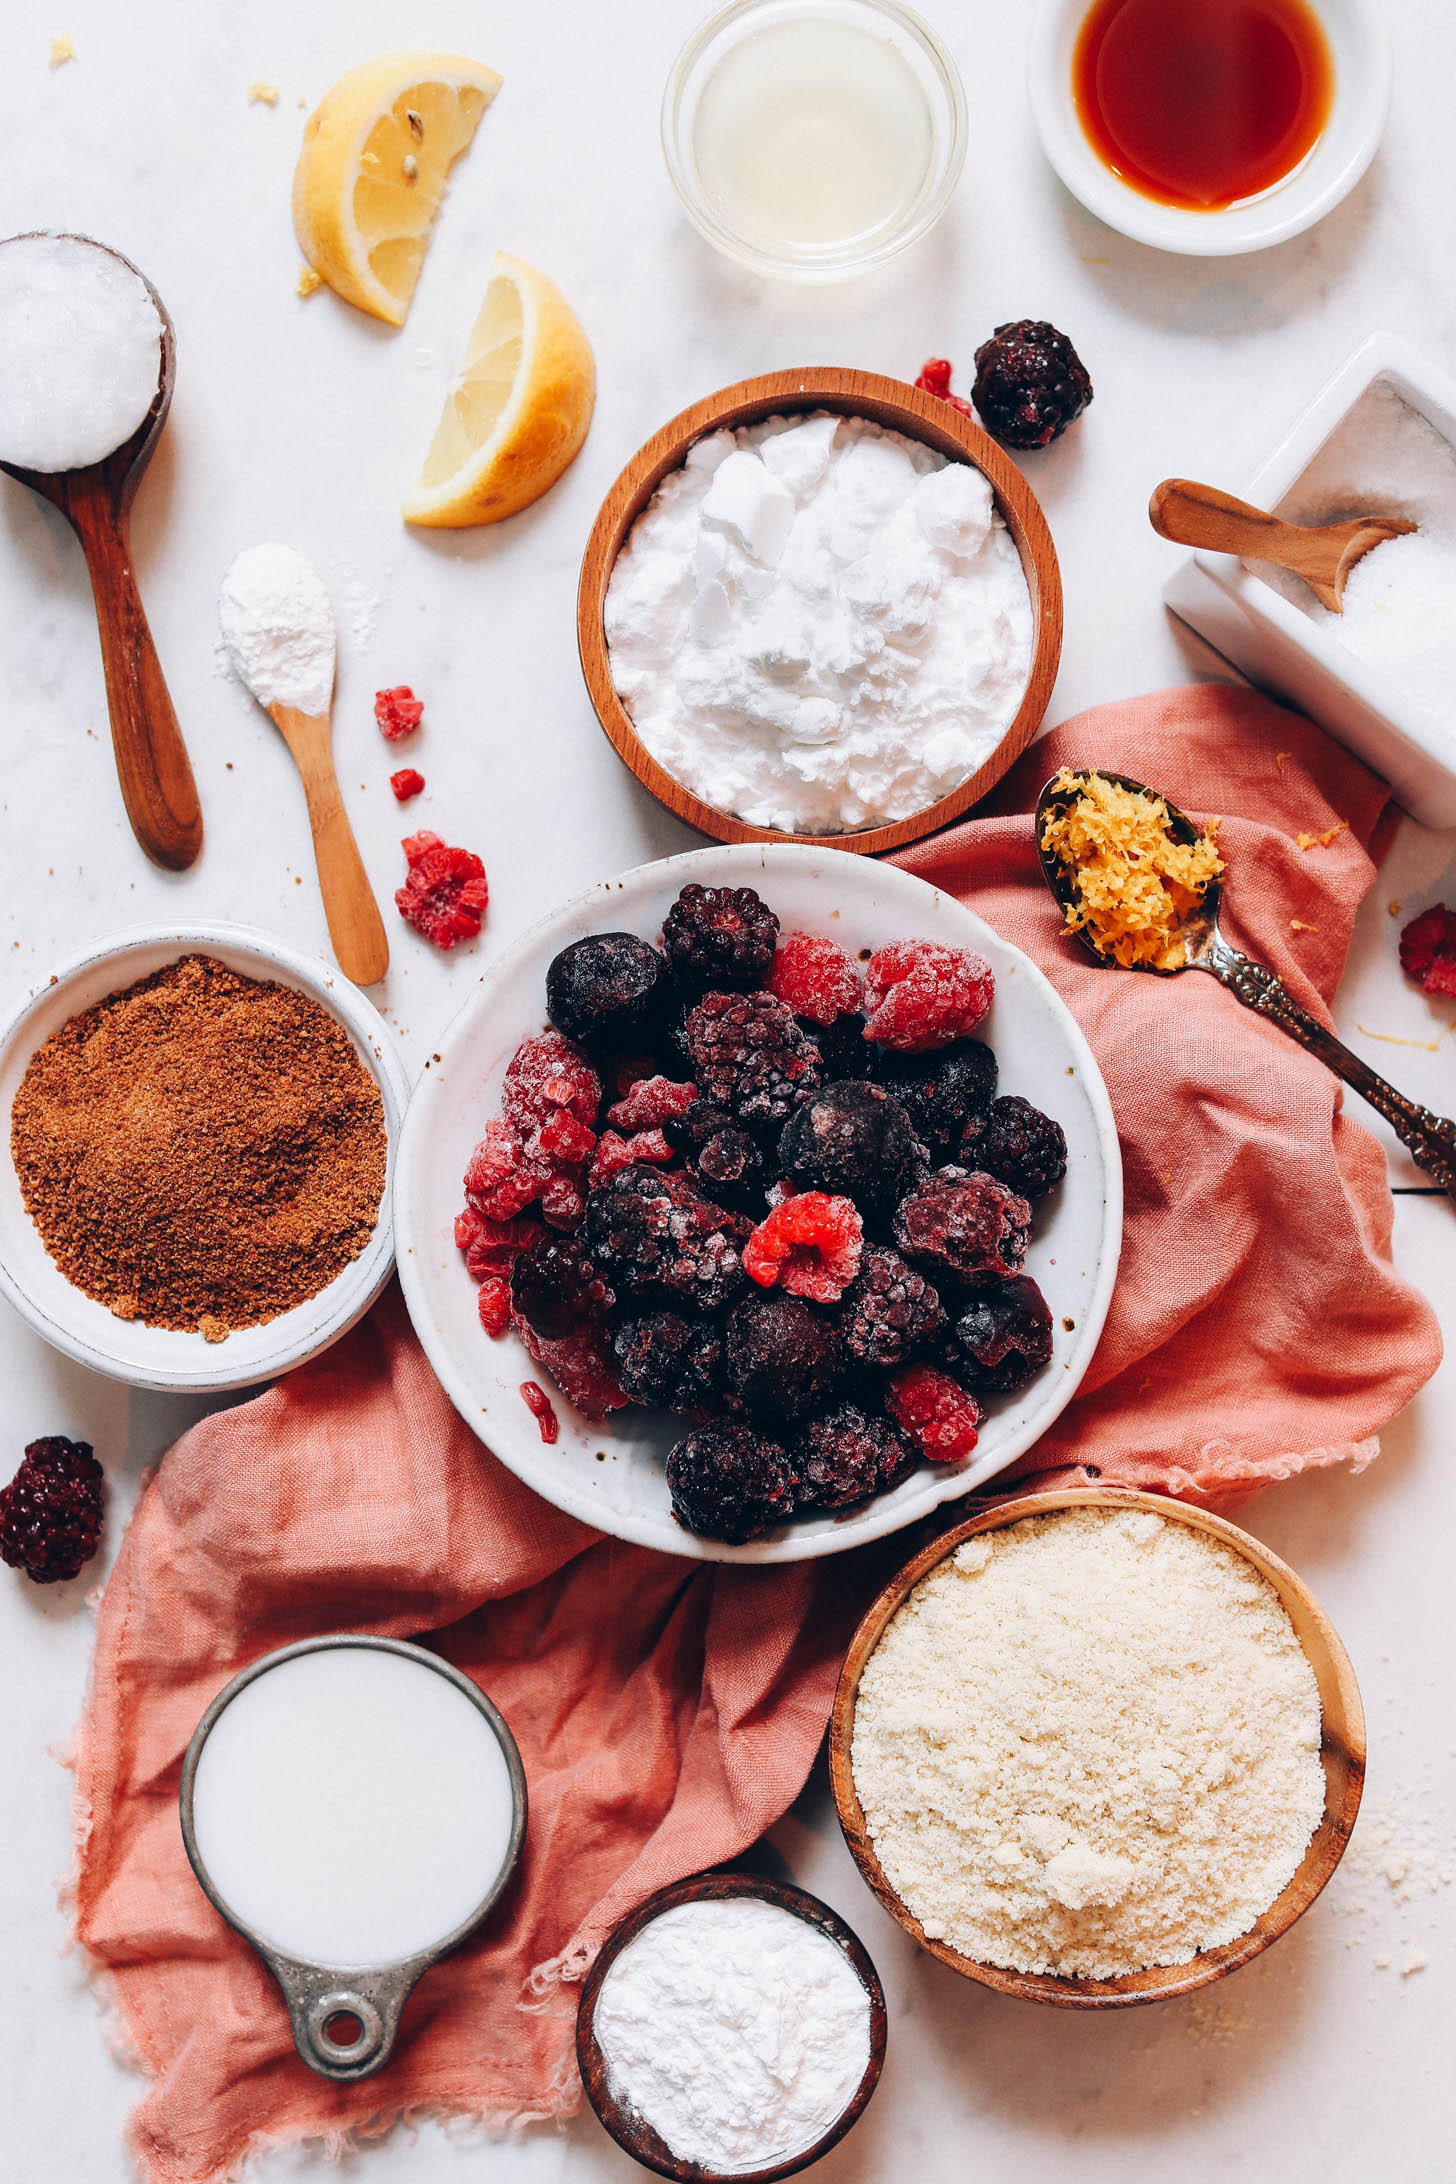 Frozen berries, coconut sugar, arrowroot powder, lemon zest, coconut milk, vanilla, apple cider vinegar, potato starch, almond flour, salt, and coconut oil